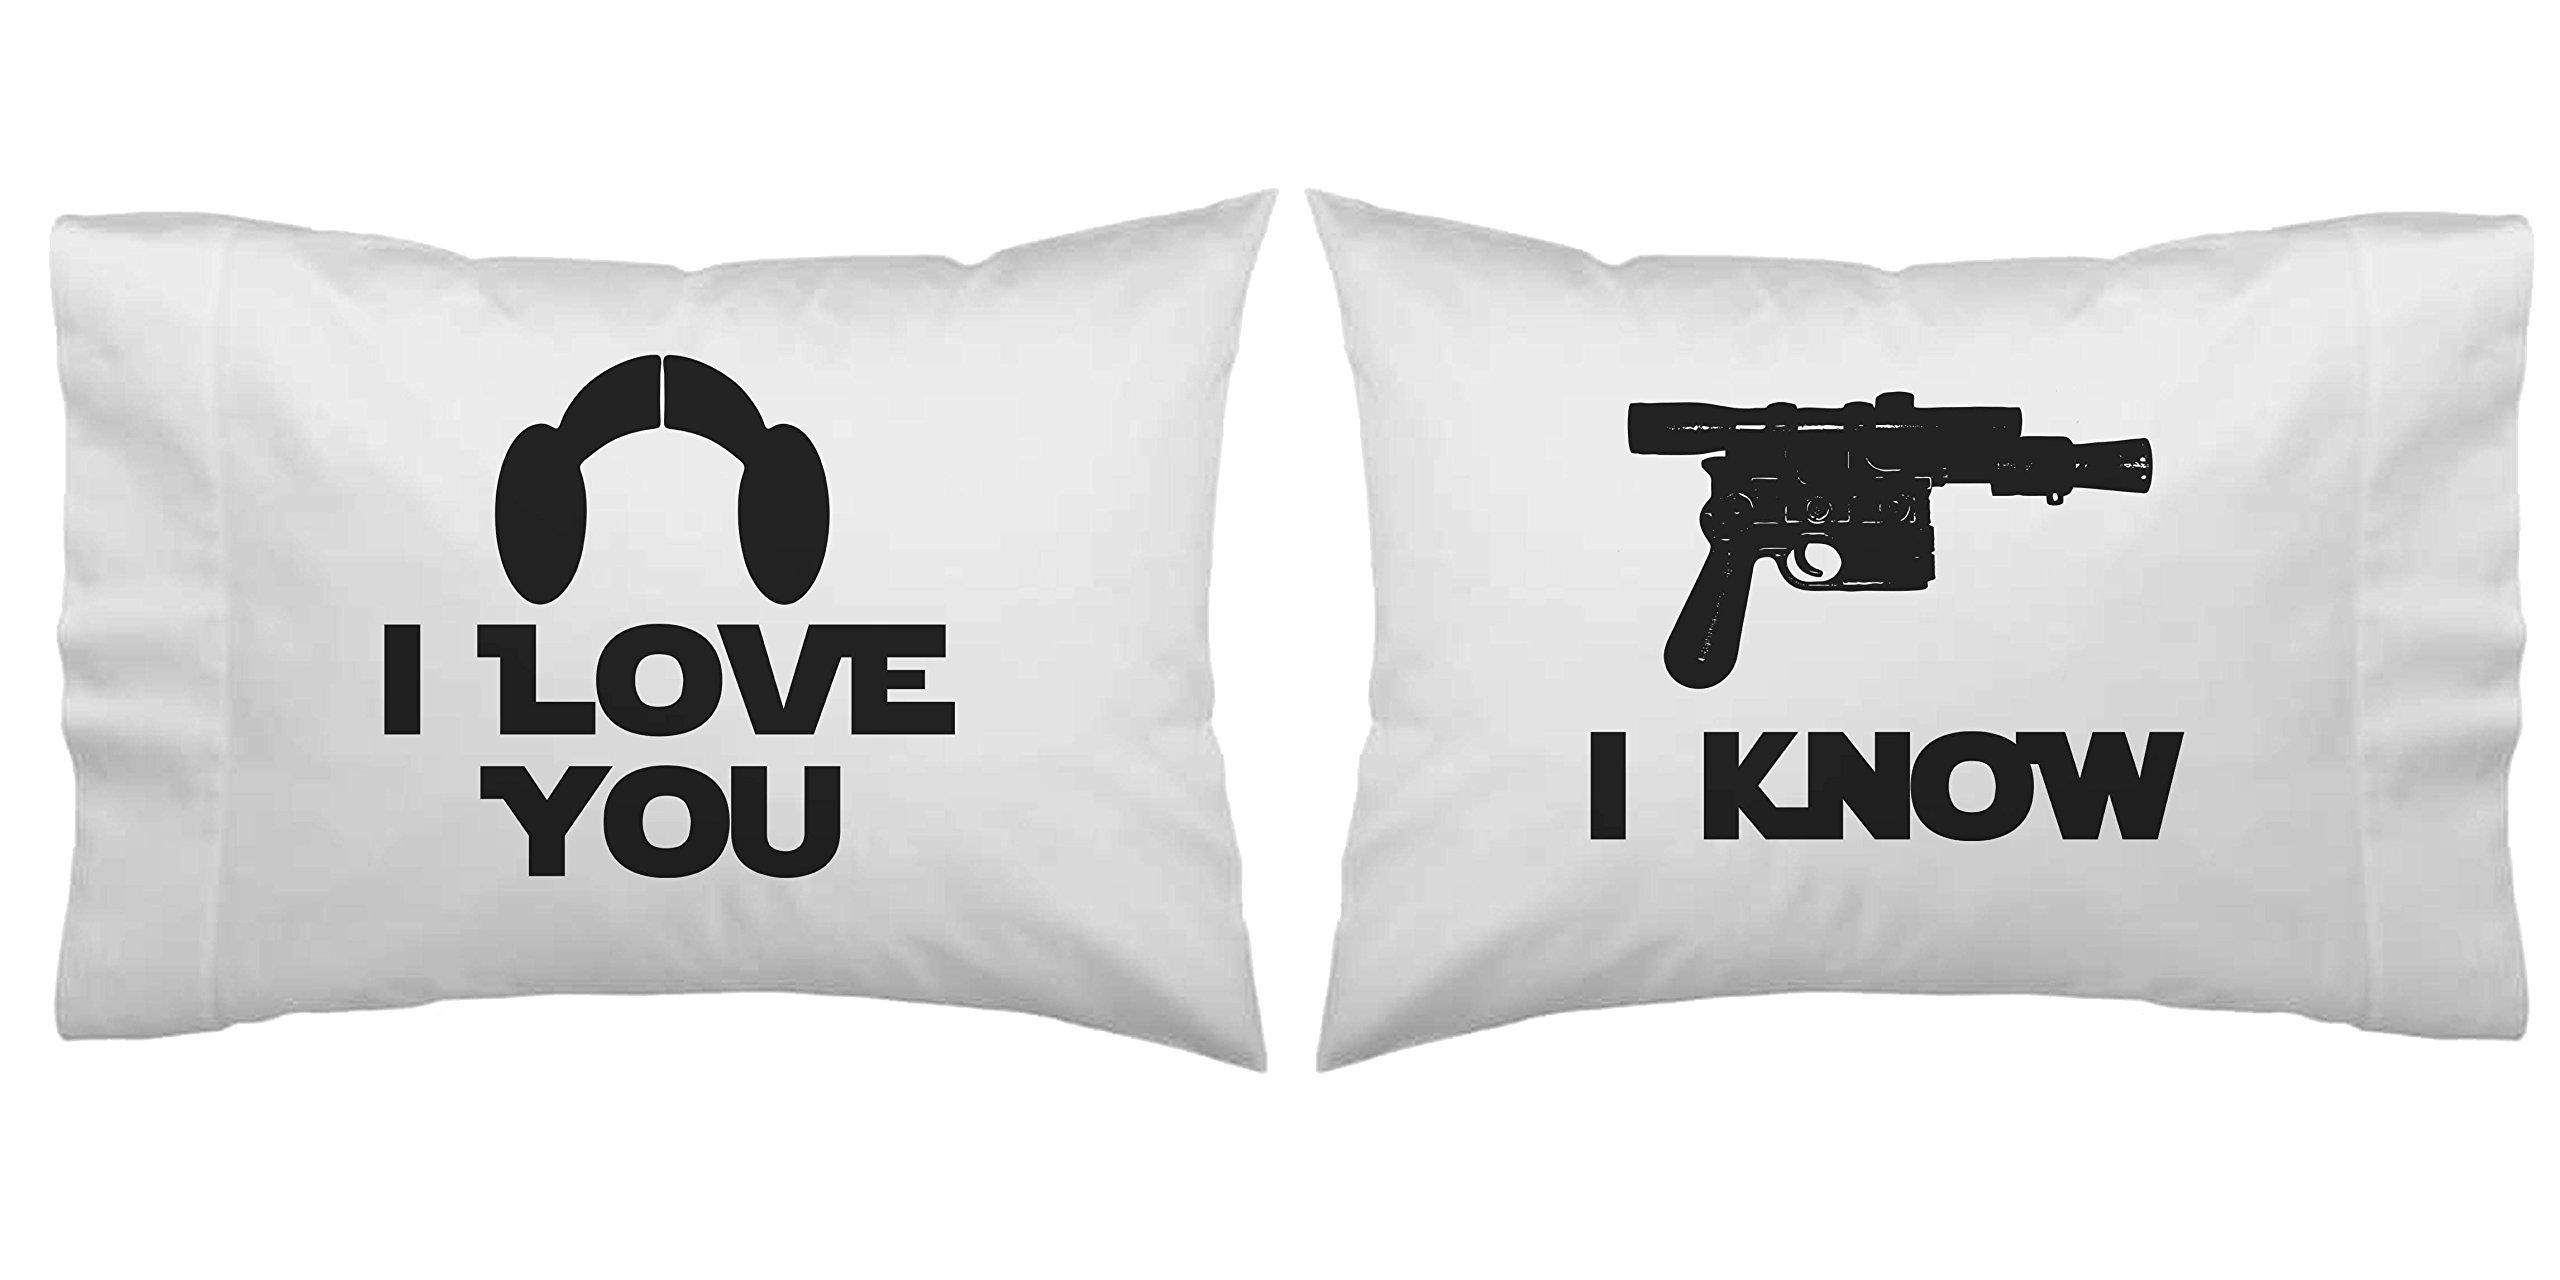 Star Wars Inspired I Love You, I Know Blaster Pillowcase Set